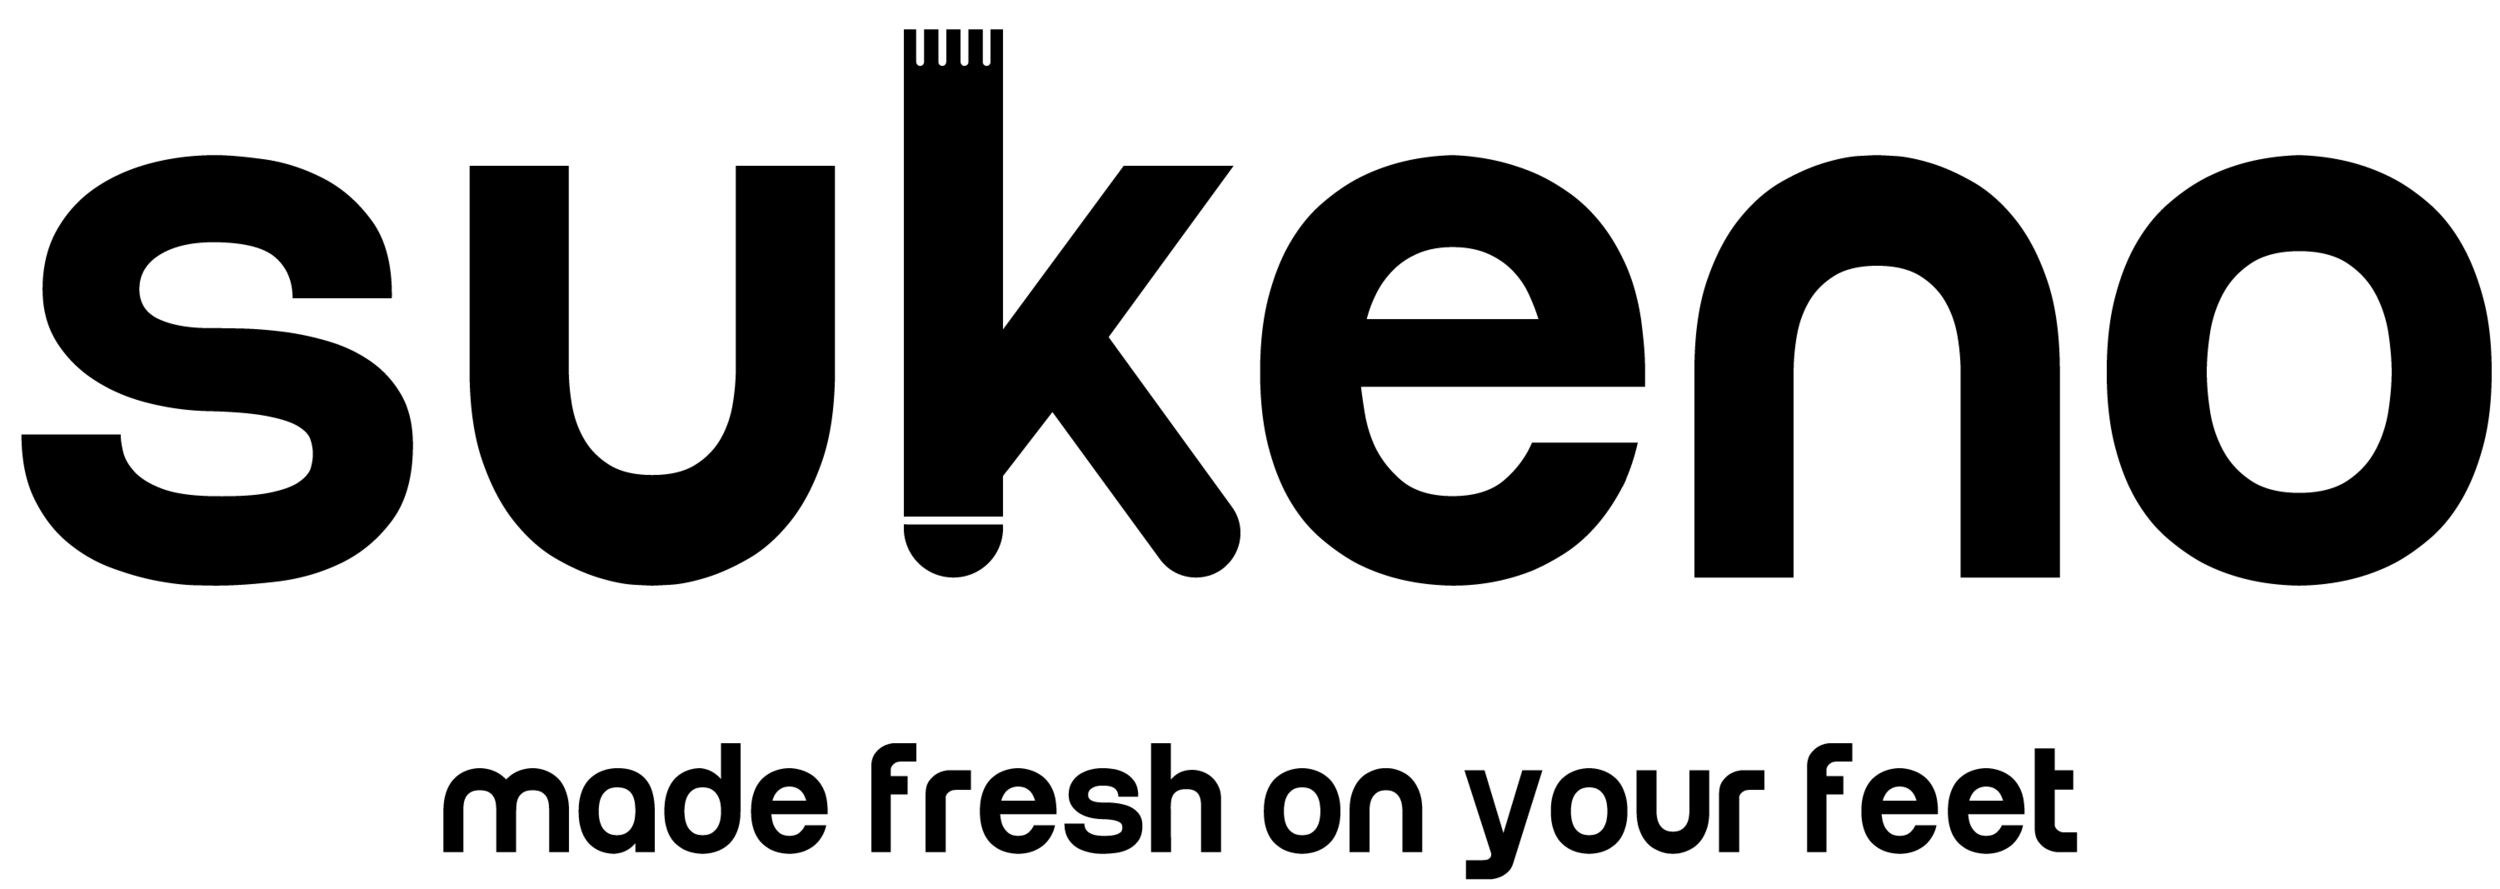 sukeno_logo black_logo_black.png